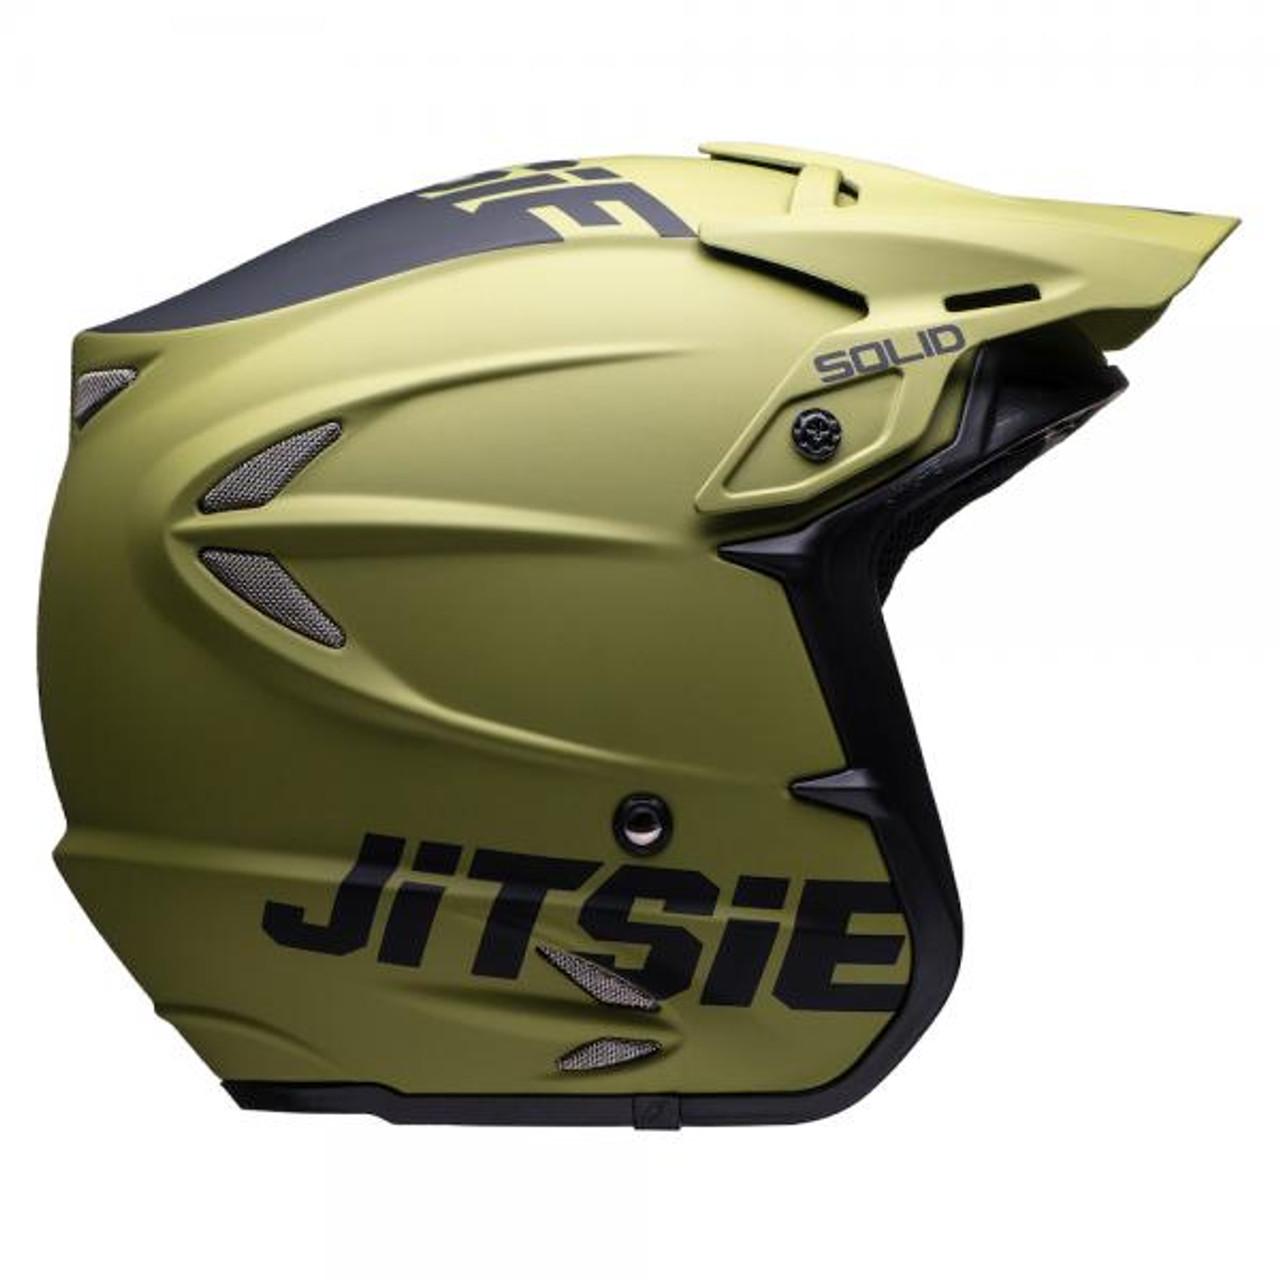 HT2 Solid helmet by Jitsie, matt khaki/ black, fiberglass